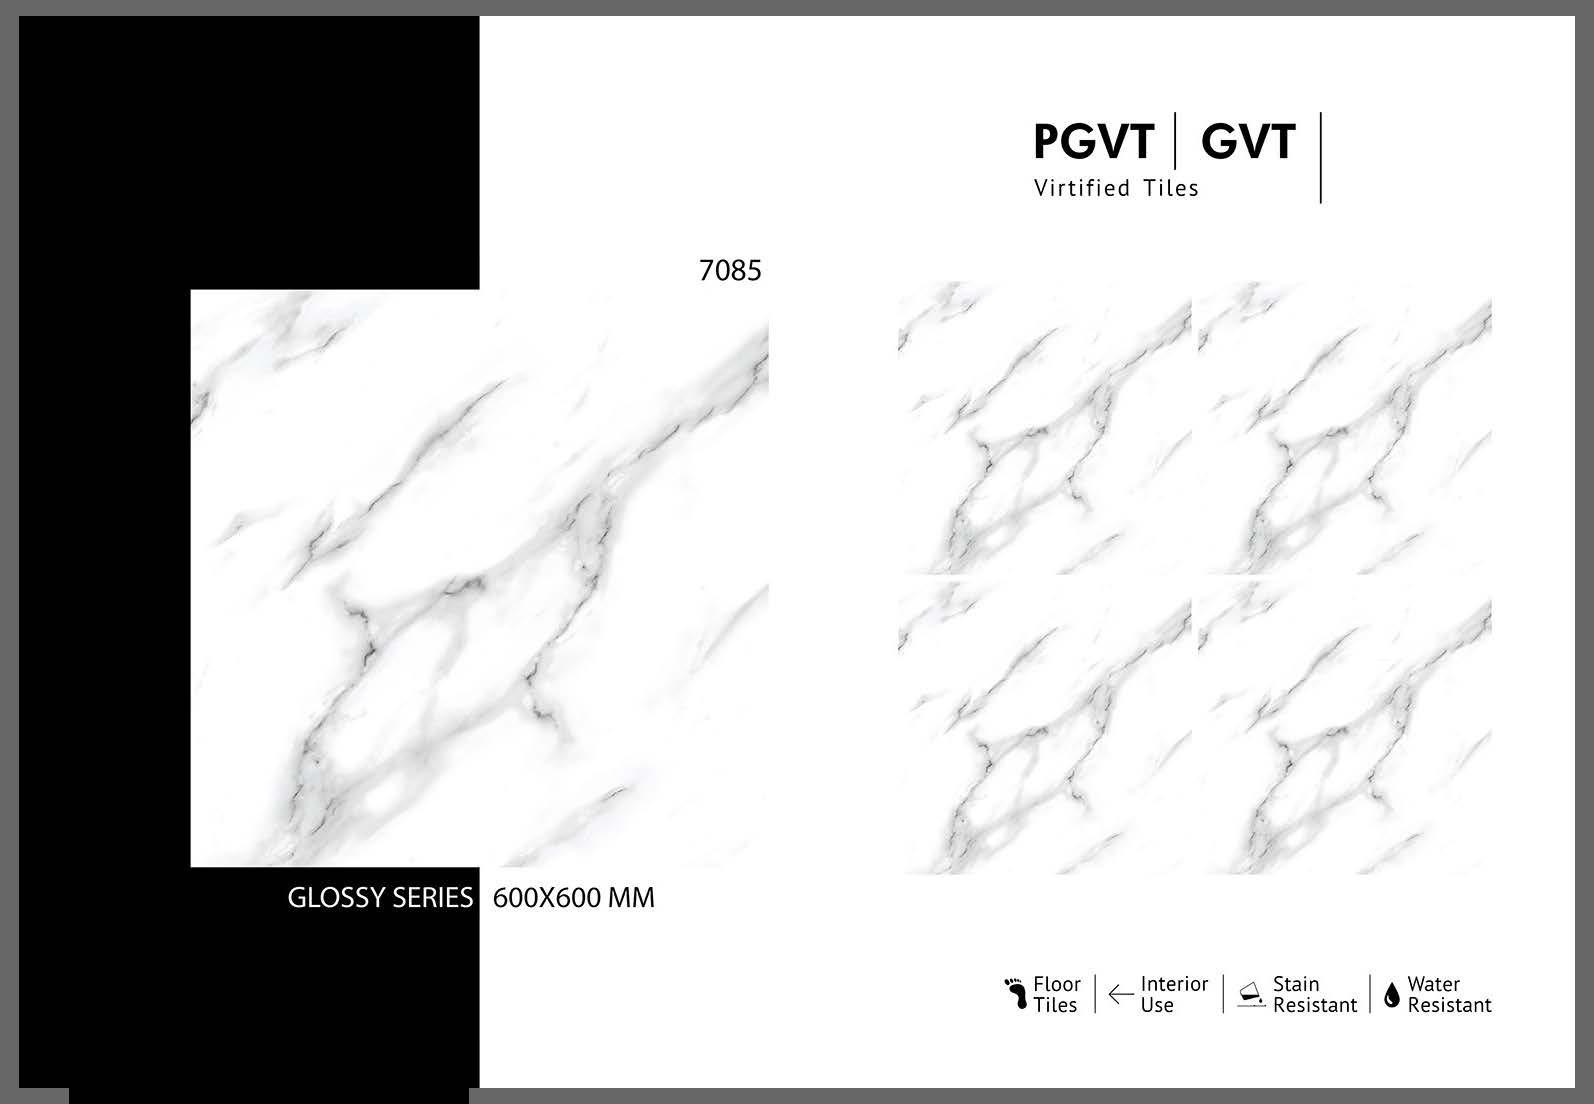 GVT 2X2 GLOSSY_Page_72.jpg